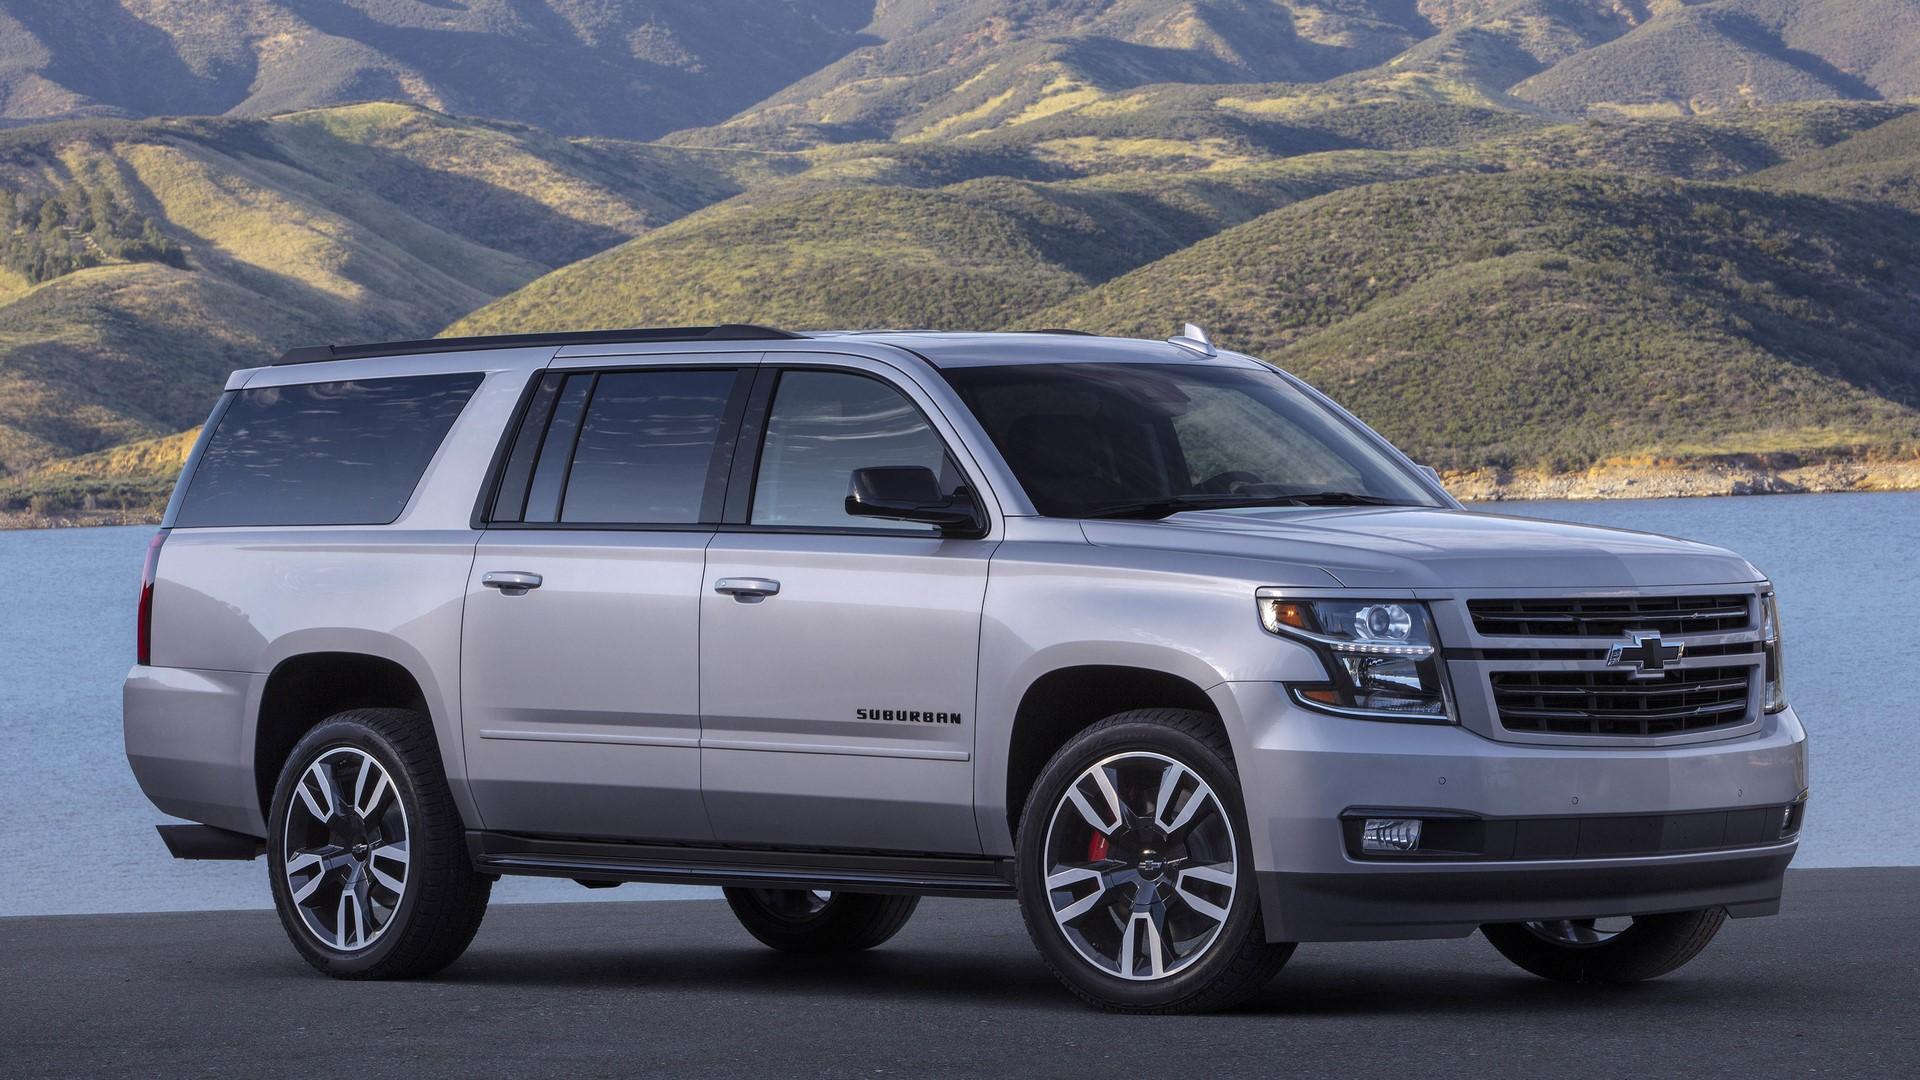 Chevrolet Suburban RST 2019 (1)